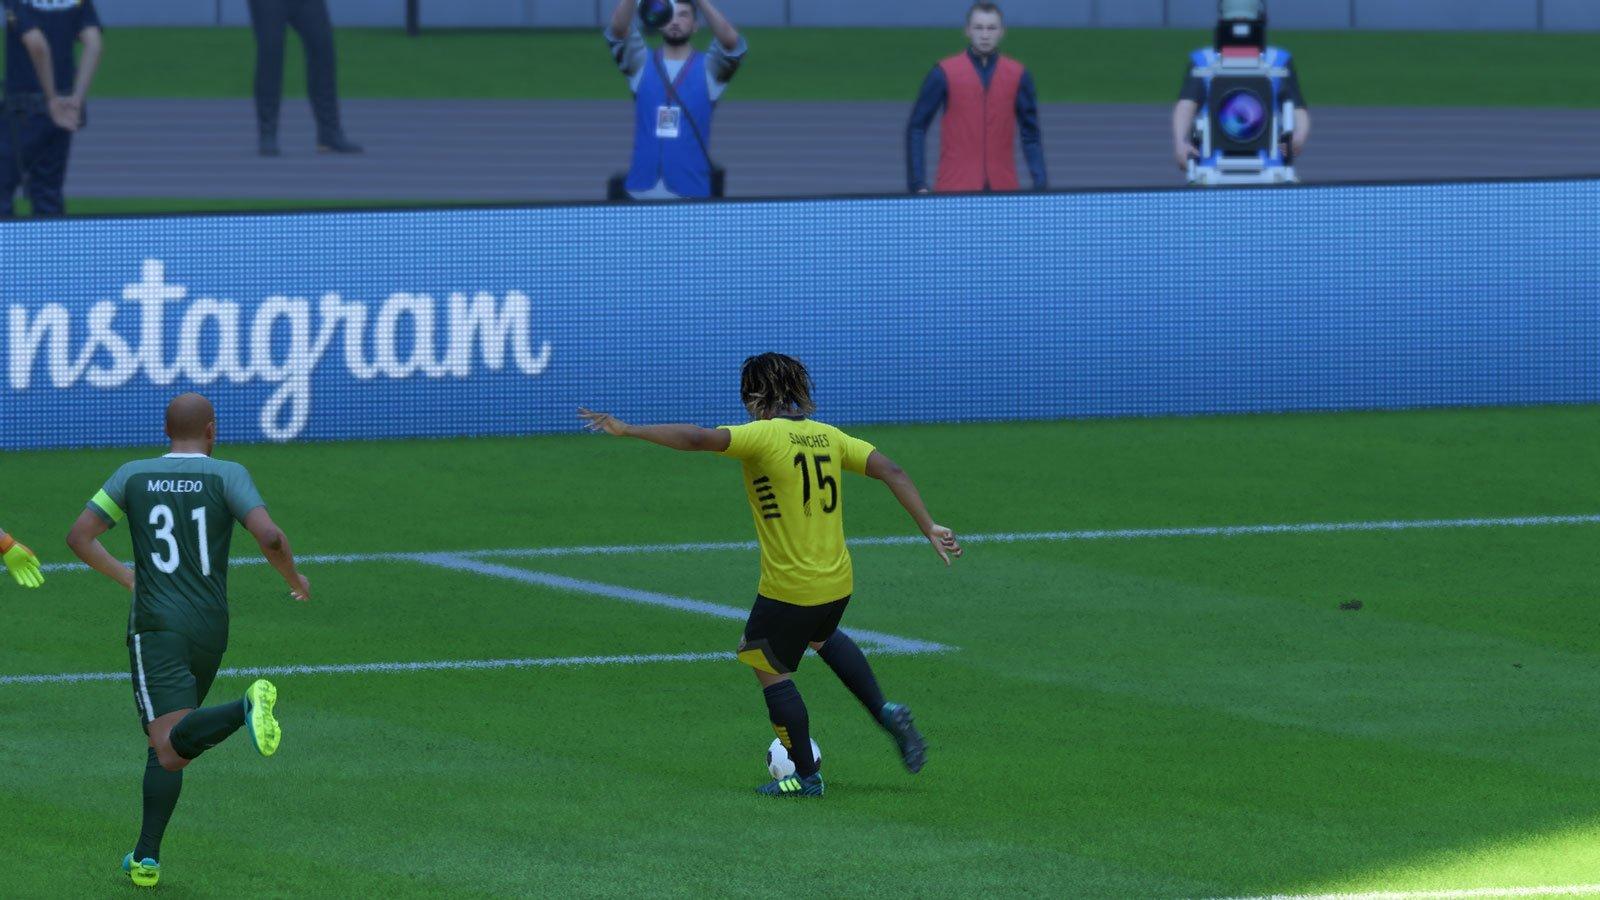 FIFA 18 Screenshot 2017.10.01 00.57.52